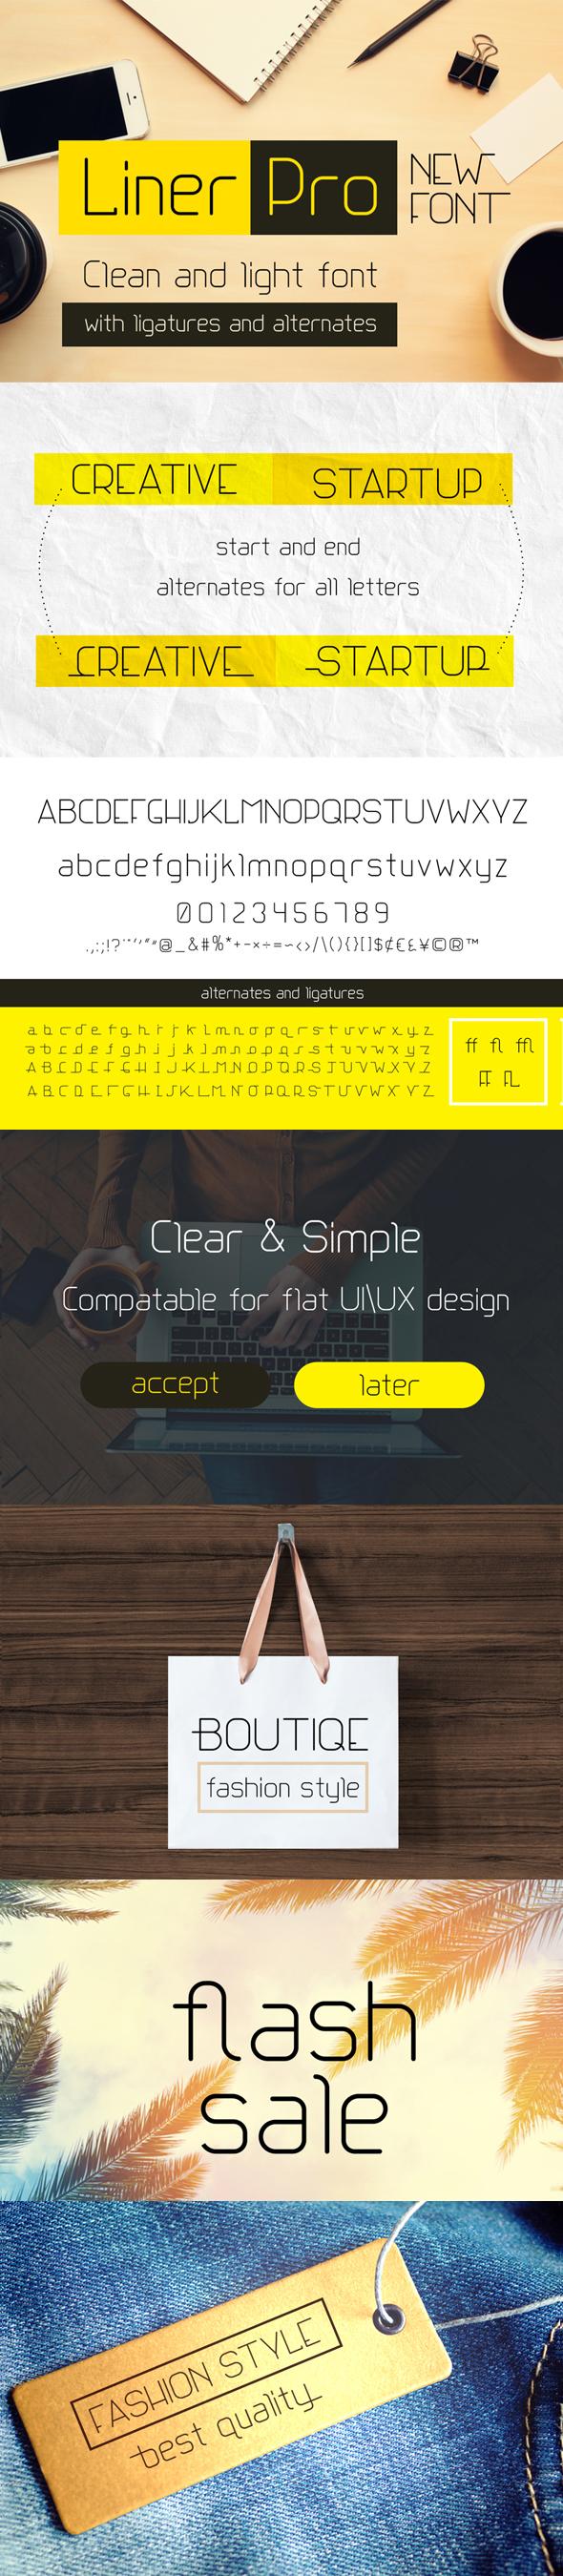 Liner Pro Font - Sans-Serif Fonts